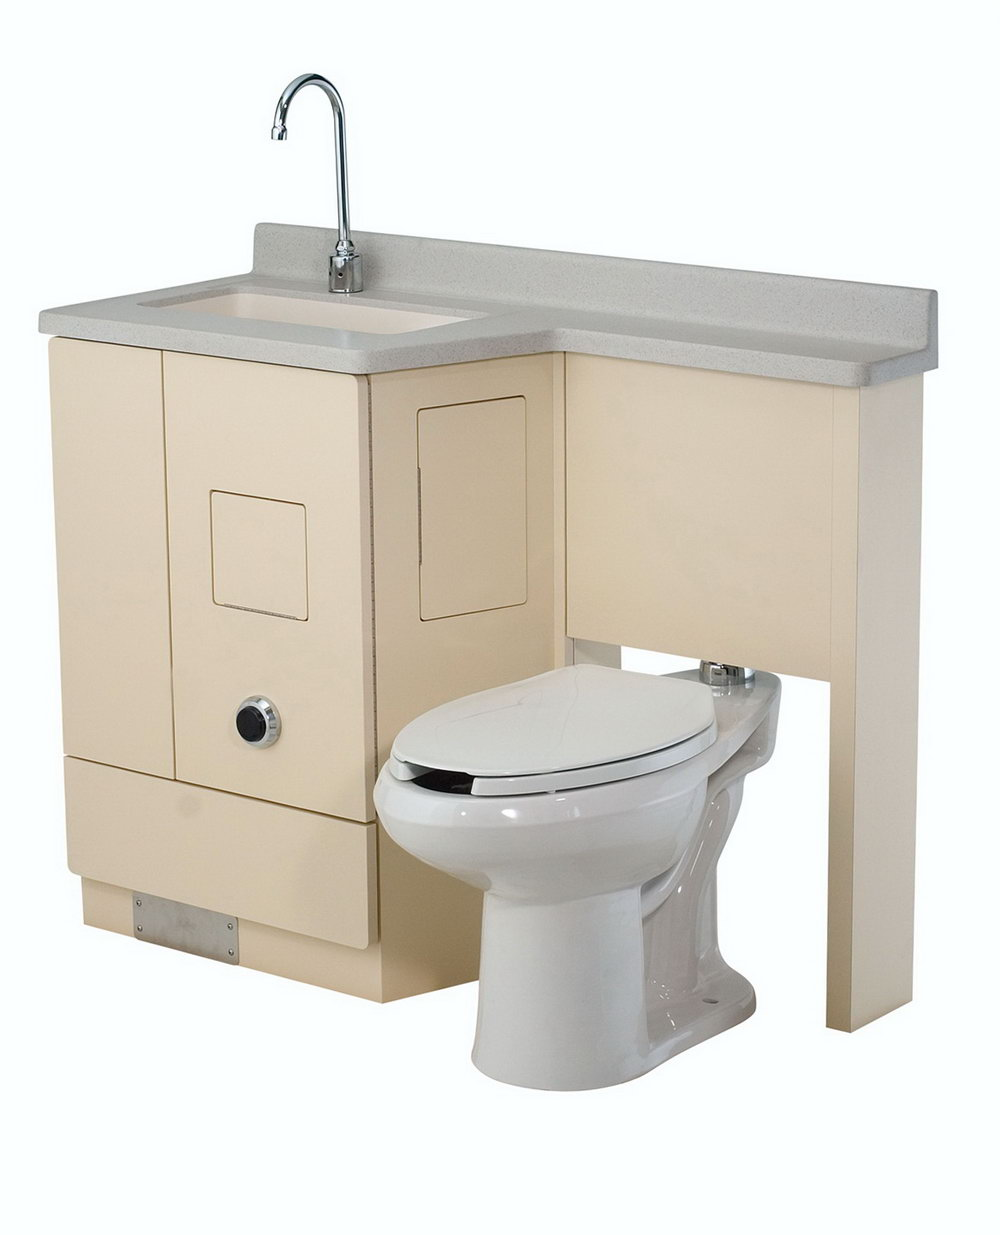 Ada Water Closet Requirements